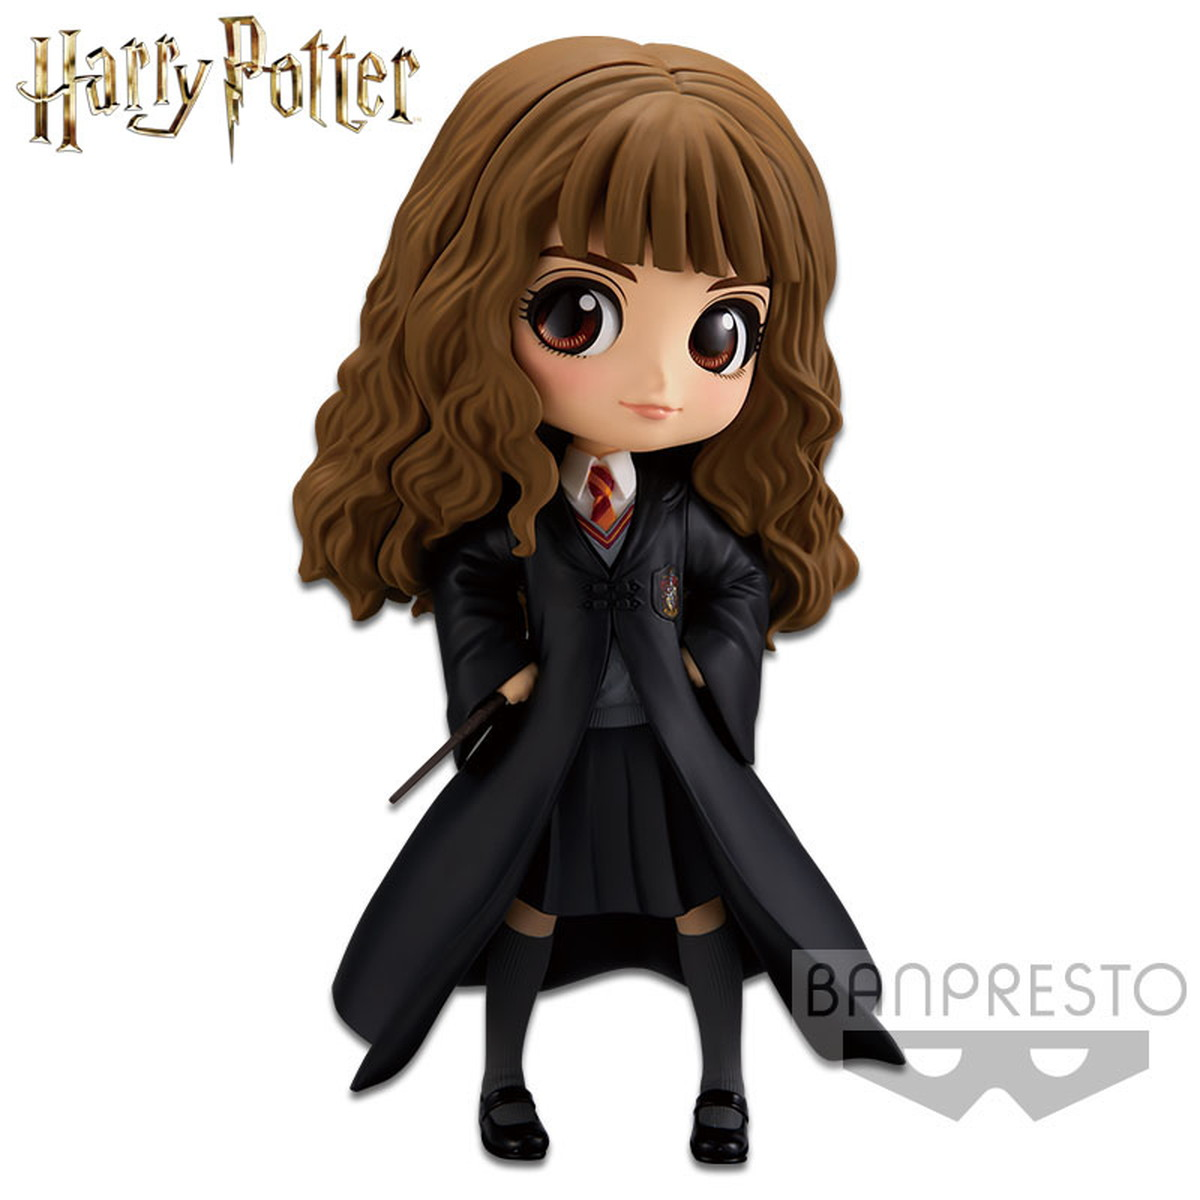 Hermione Granger II Ver. A Q Posket Figure